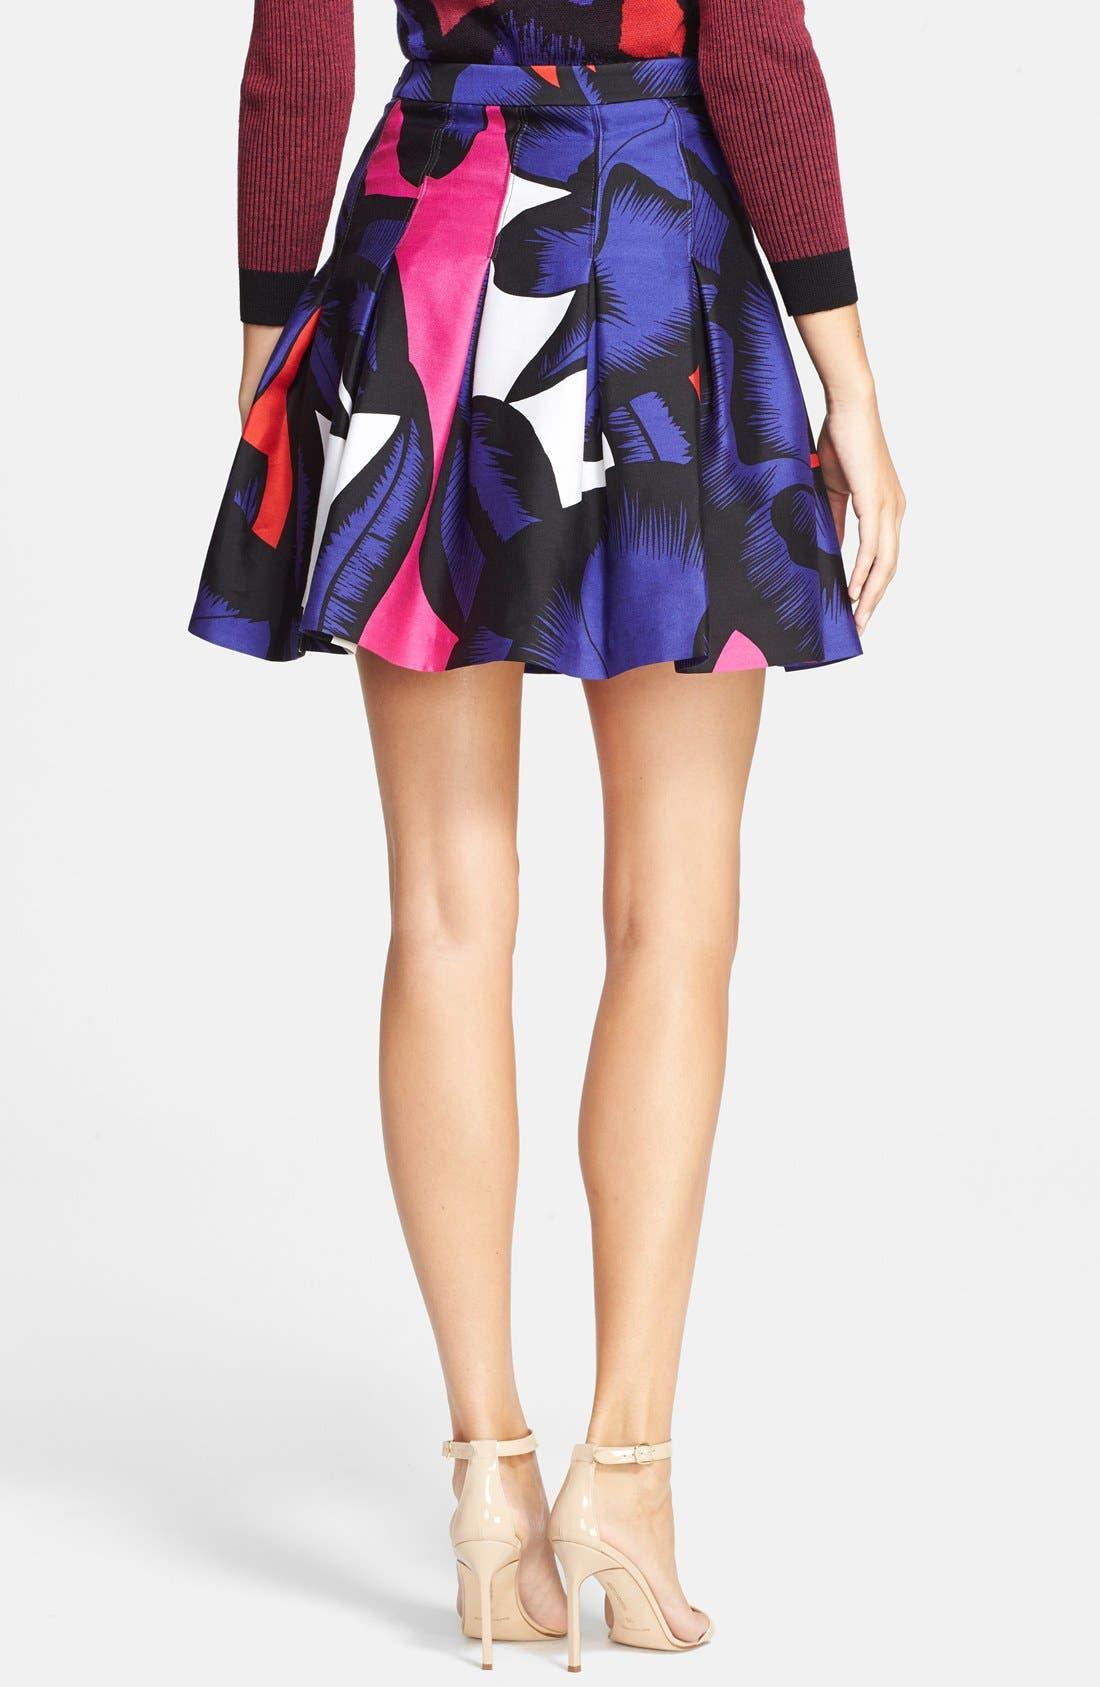 DIANE VON FURSTENBERG, 'Gemma' Print Pleated Skirt, Alternate thumbnail 2, color, 500